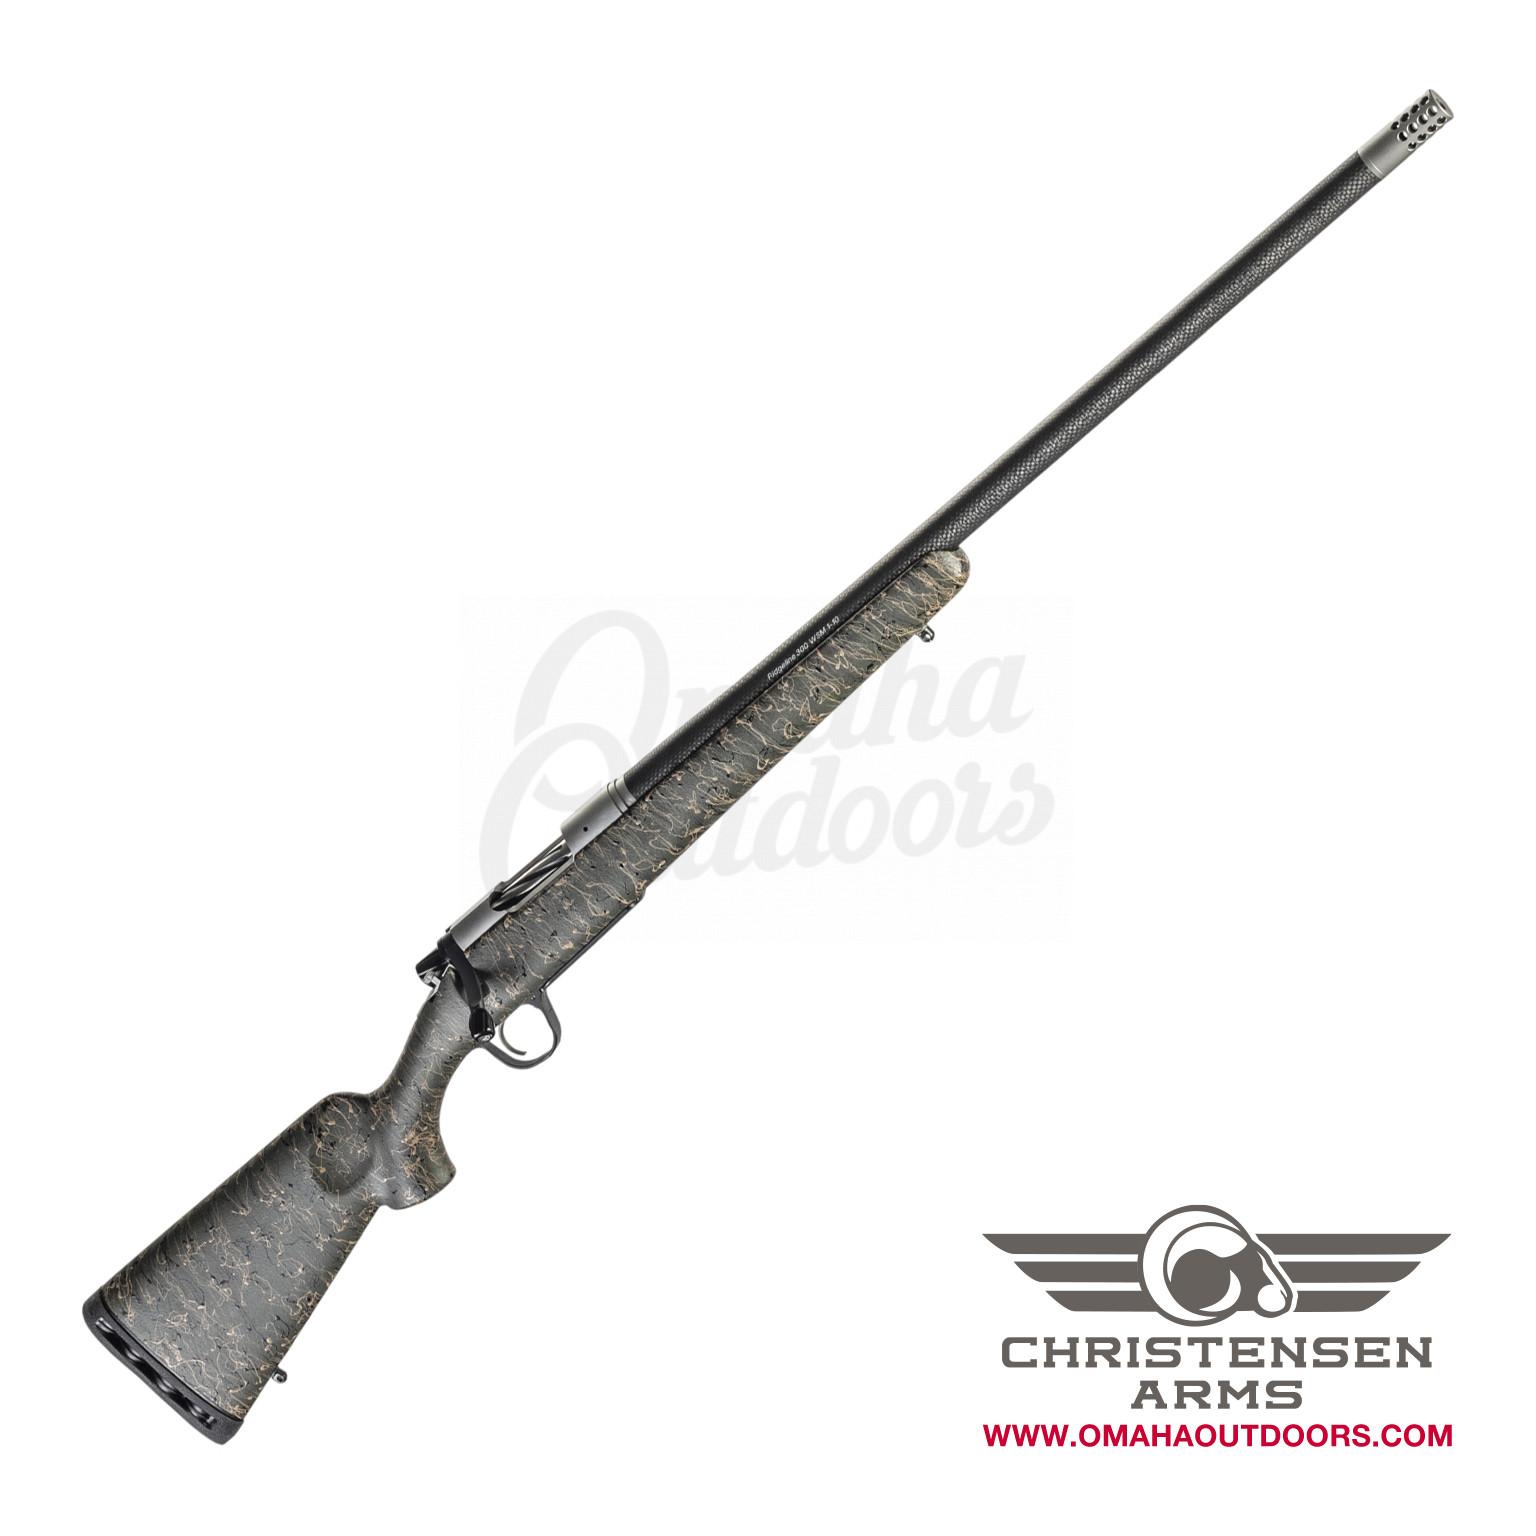 Christensen Arms Ridgeline Green Bolt Rifle 28 Nosler 3 RD 26″  CA10299-815313